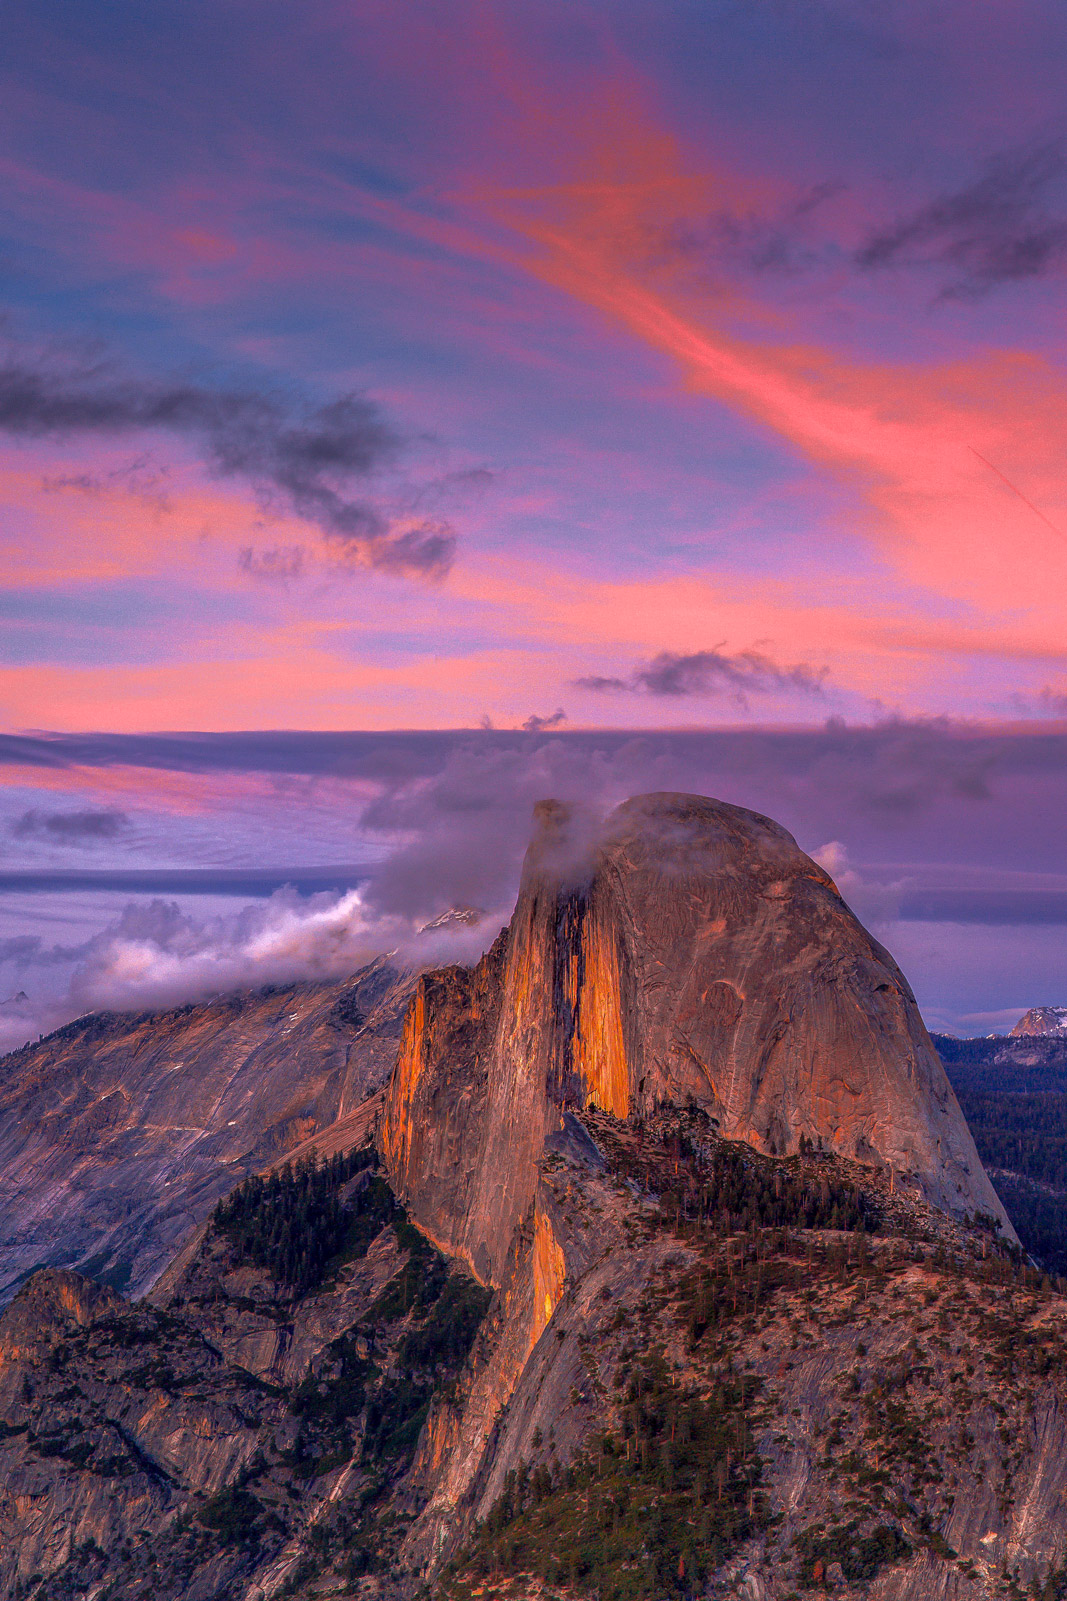 California, Yosemite, Half Dome, Sunset, limited edition, photograph, fine art, landscape, glacier point, photo